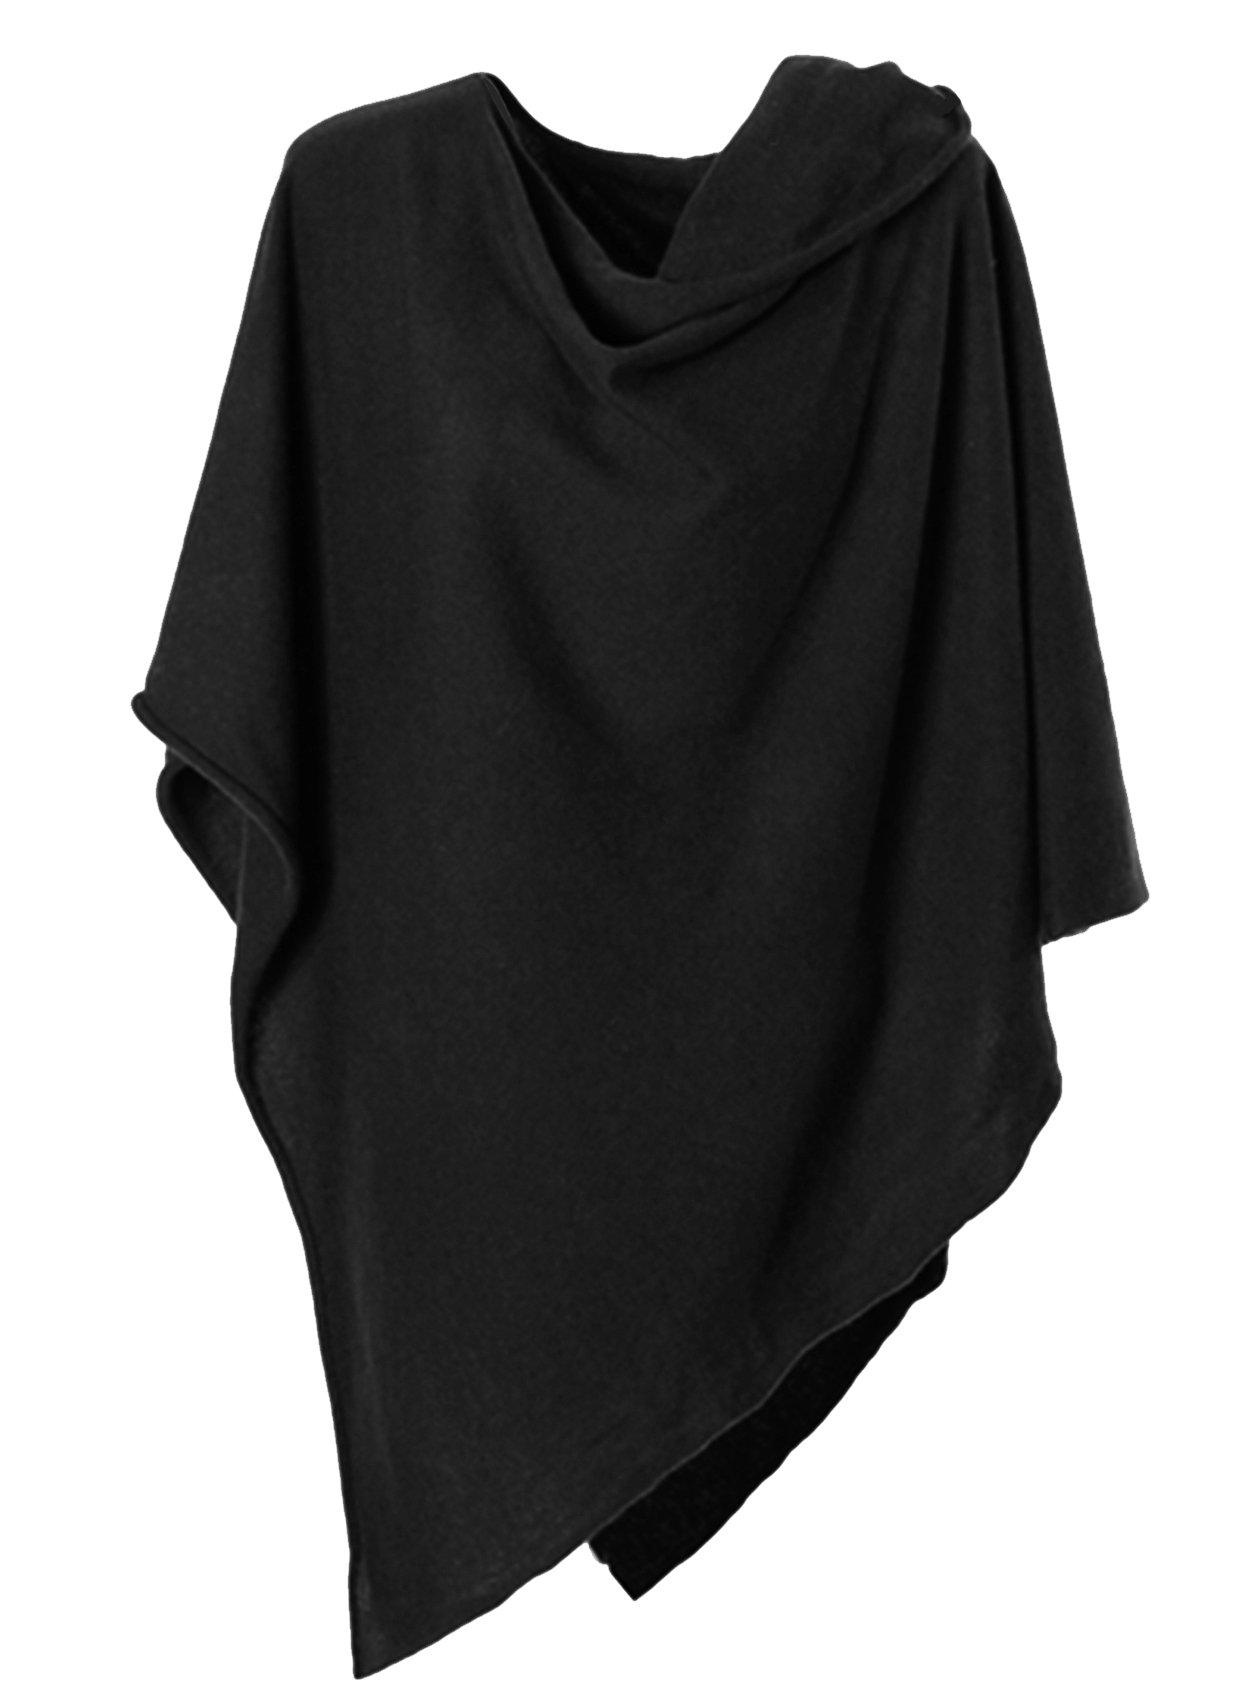 Anna Kristine Pure Cashmere Asymmetrical Draped Poncho - Obsidian Black